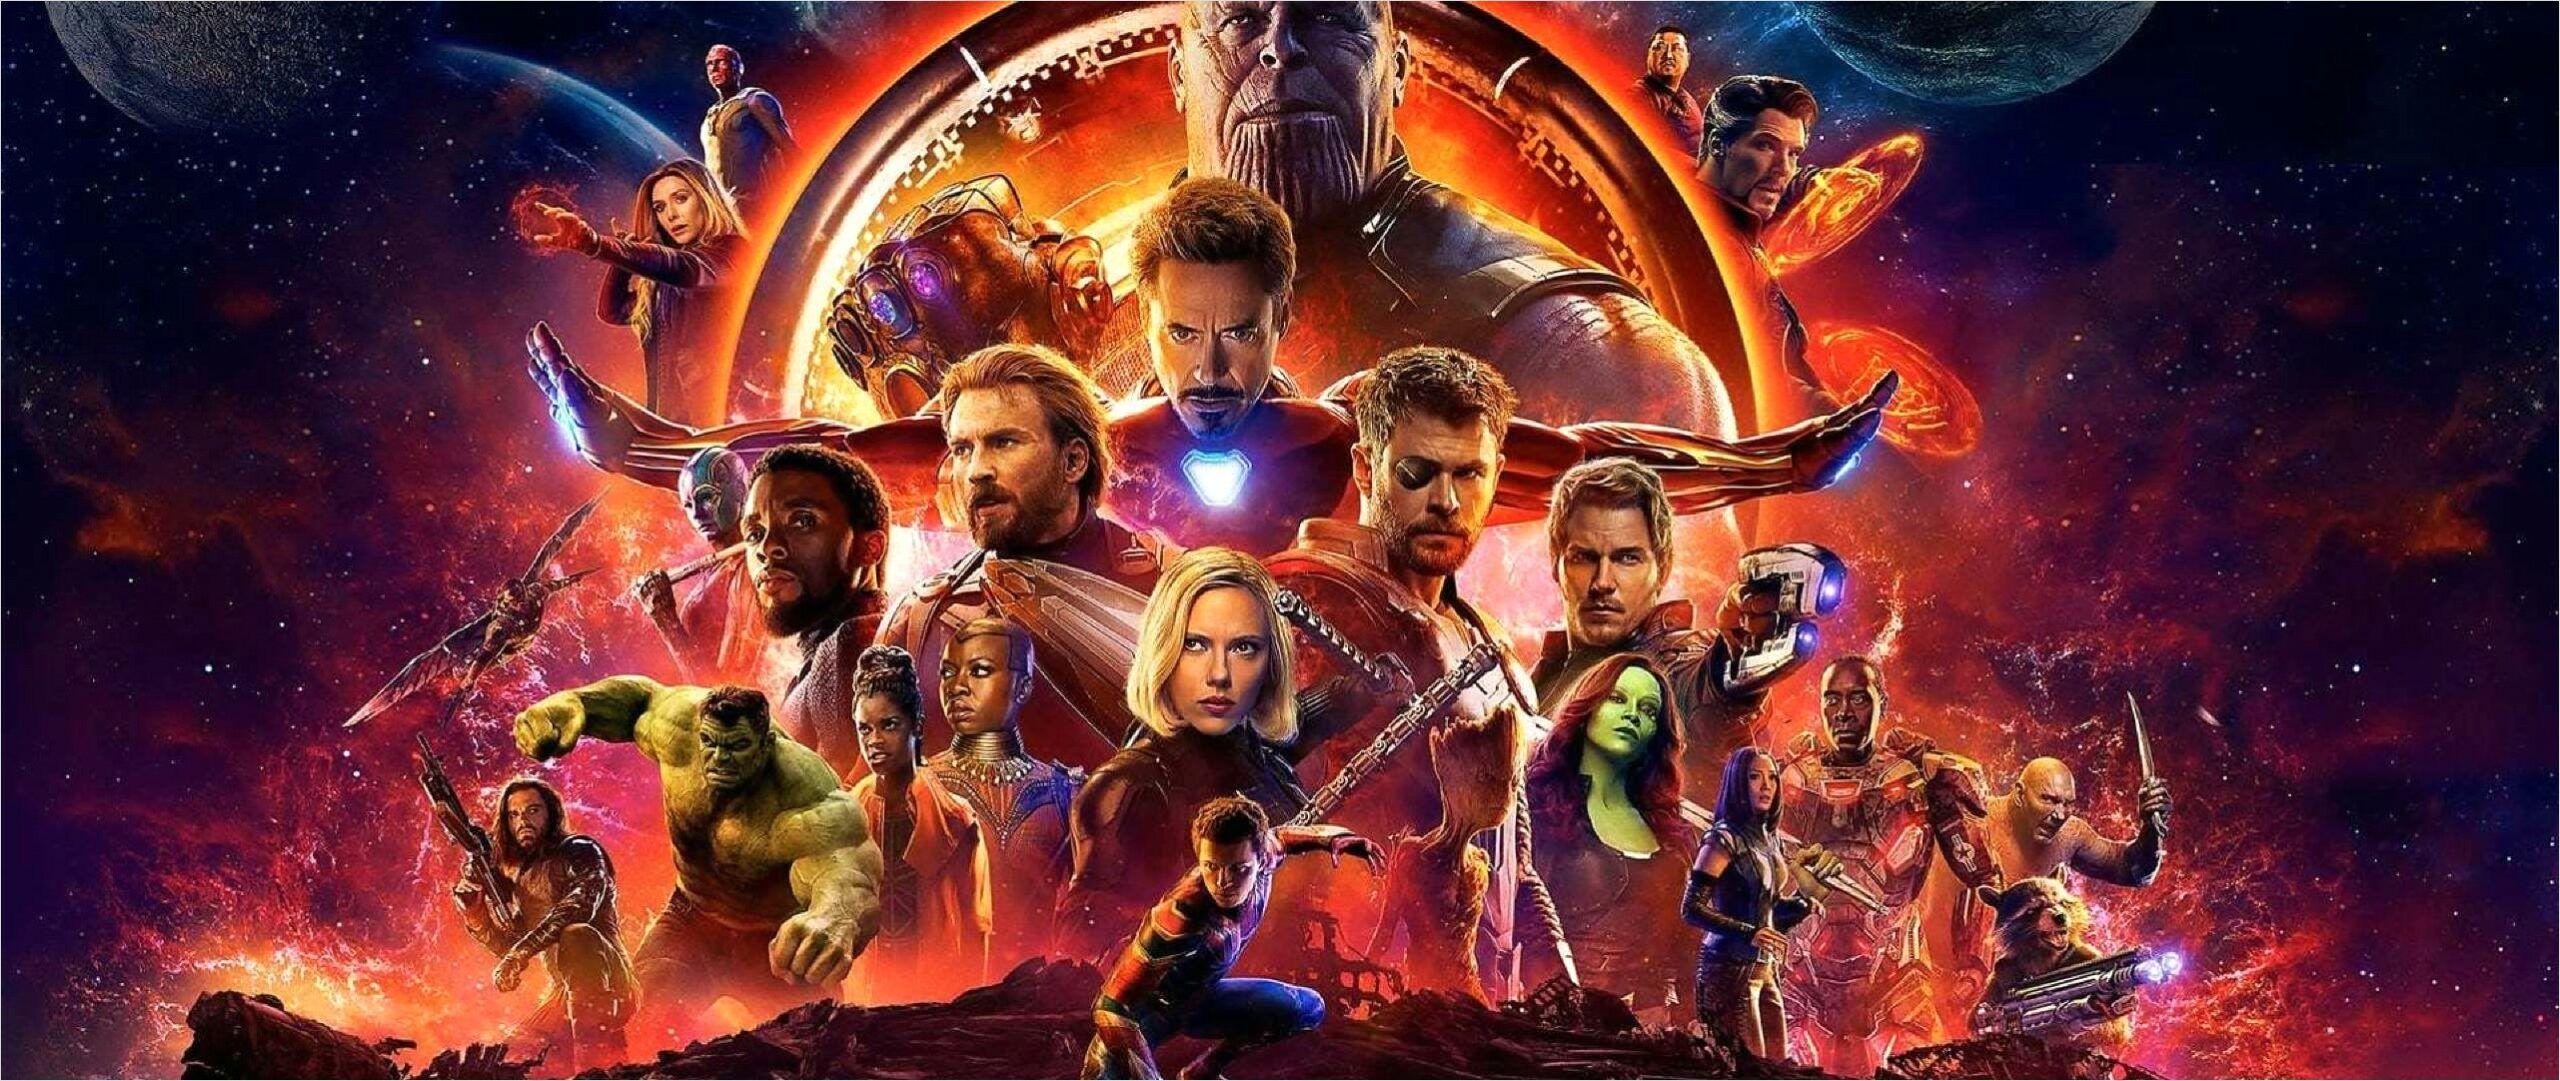 4k Dual Monitor Wallpapers Infinity War In 2020 Infinity War